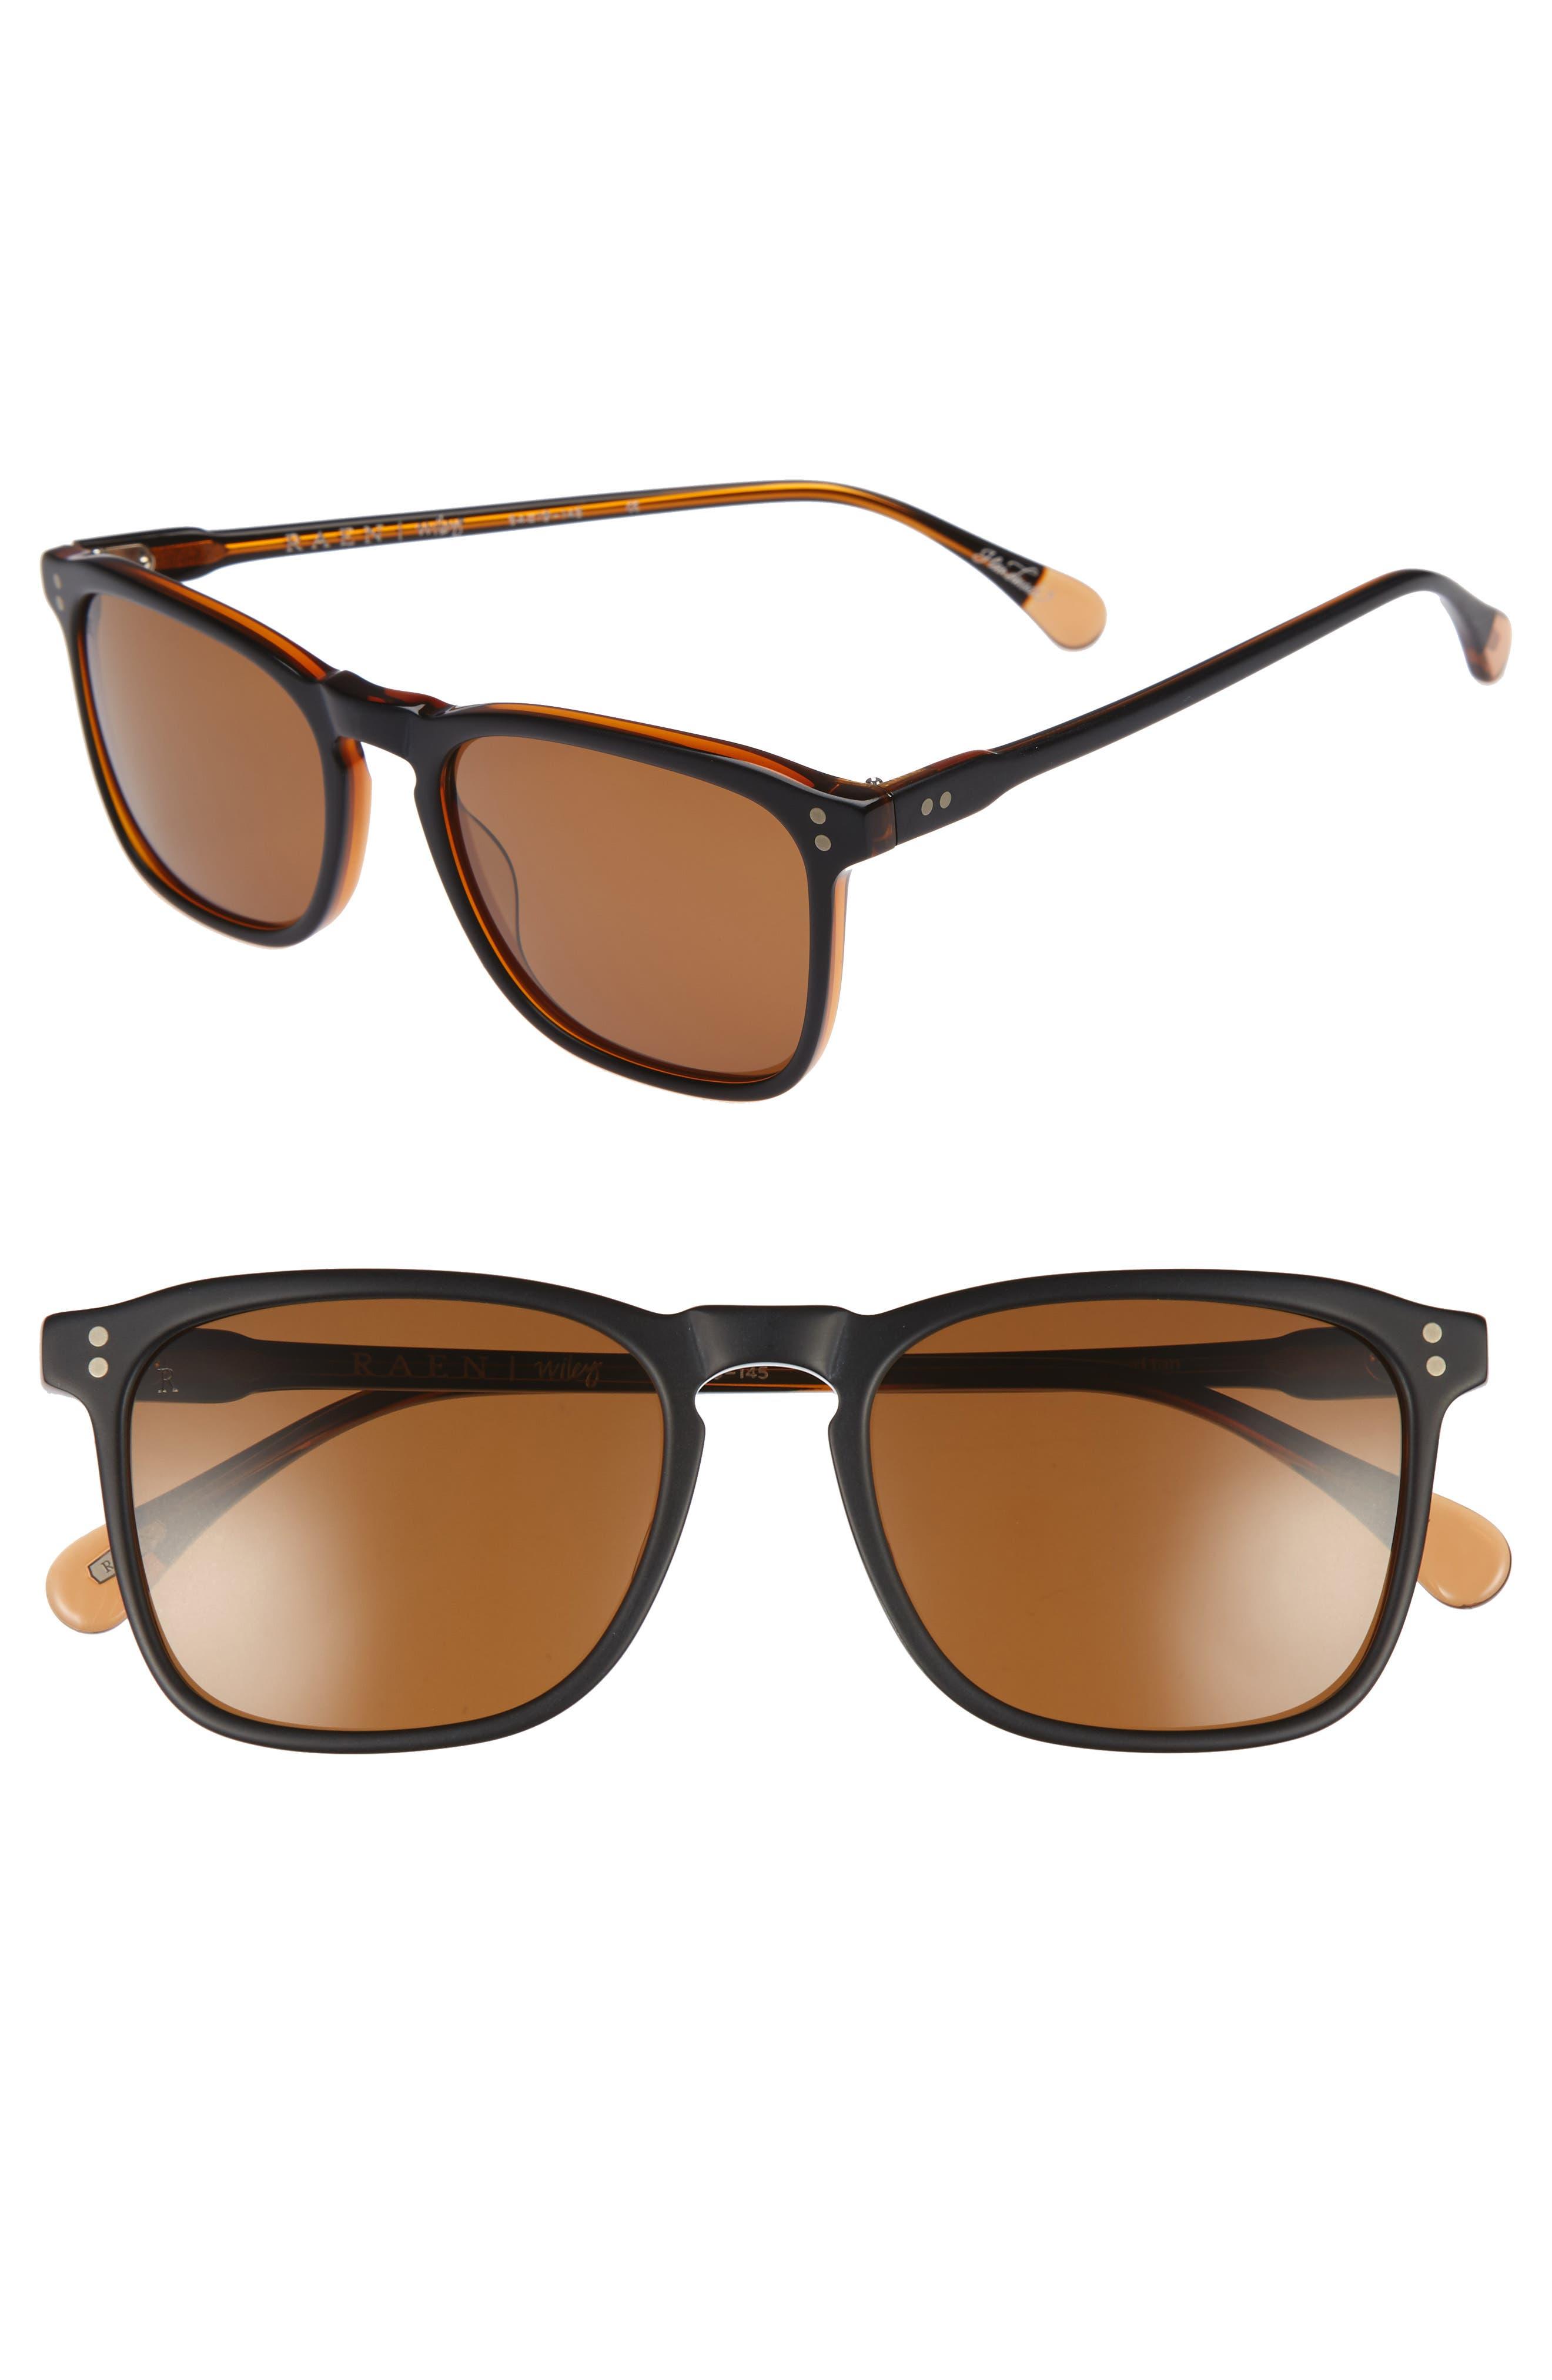 Wiley 54mm Polarized Sunglasses,                             Main thumbnail 1, color,                             004